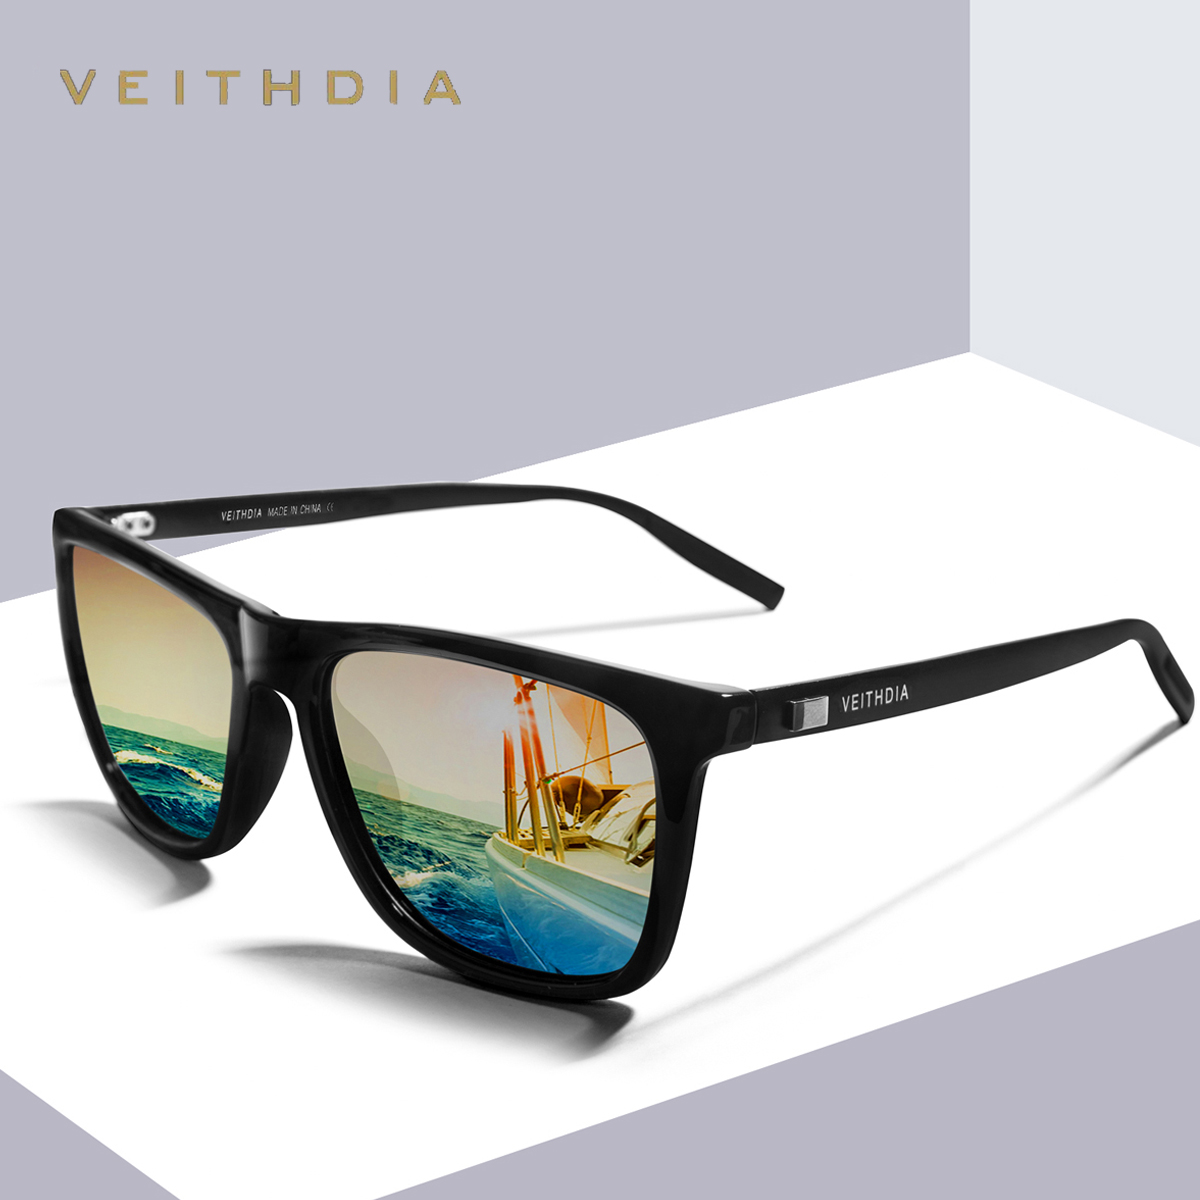 VEITHDIA Μάρκα Unisex Ρετρό Αλουμίνιο + TR90 Γυαλιά ηλίου Polarized Φακός Vintage Γυαλιά Αξεσουάρ Γυαλιά Ηλίου για Άνδρες / Γυναίκες 6108